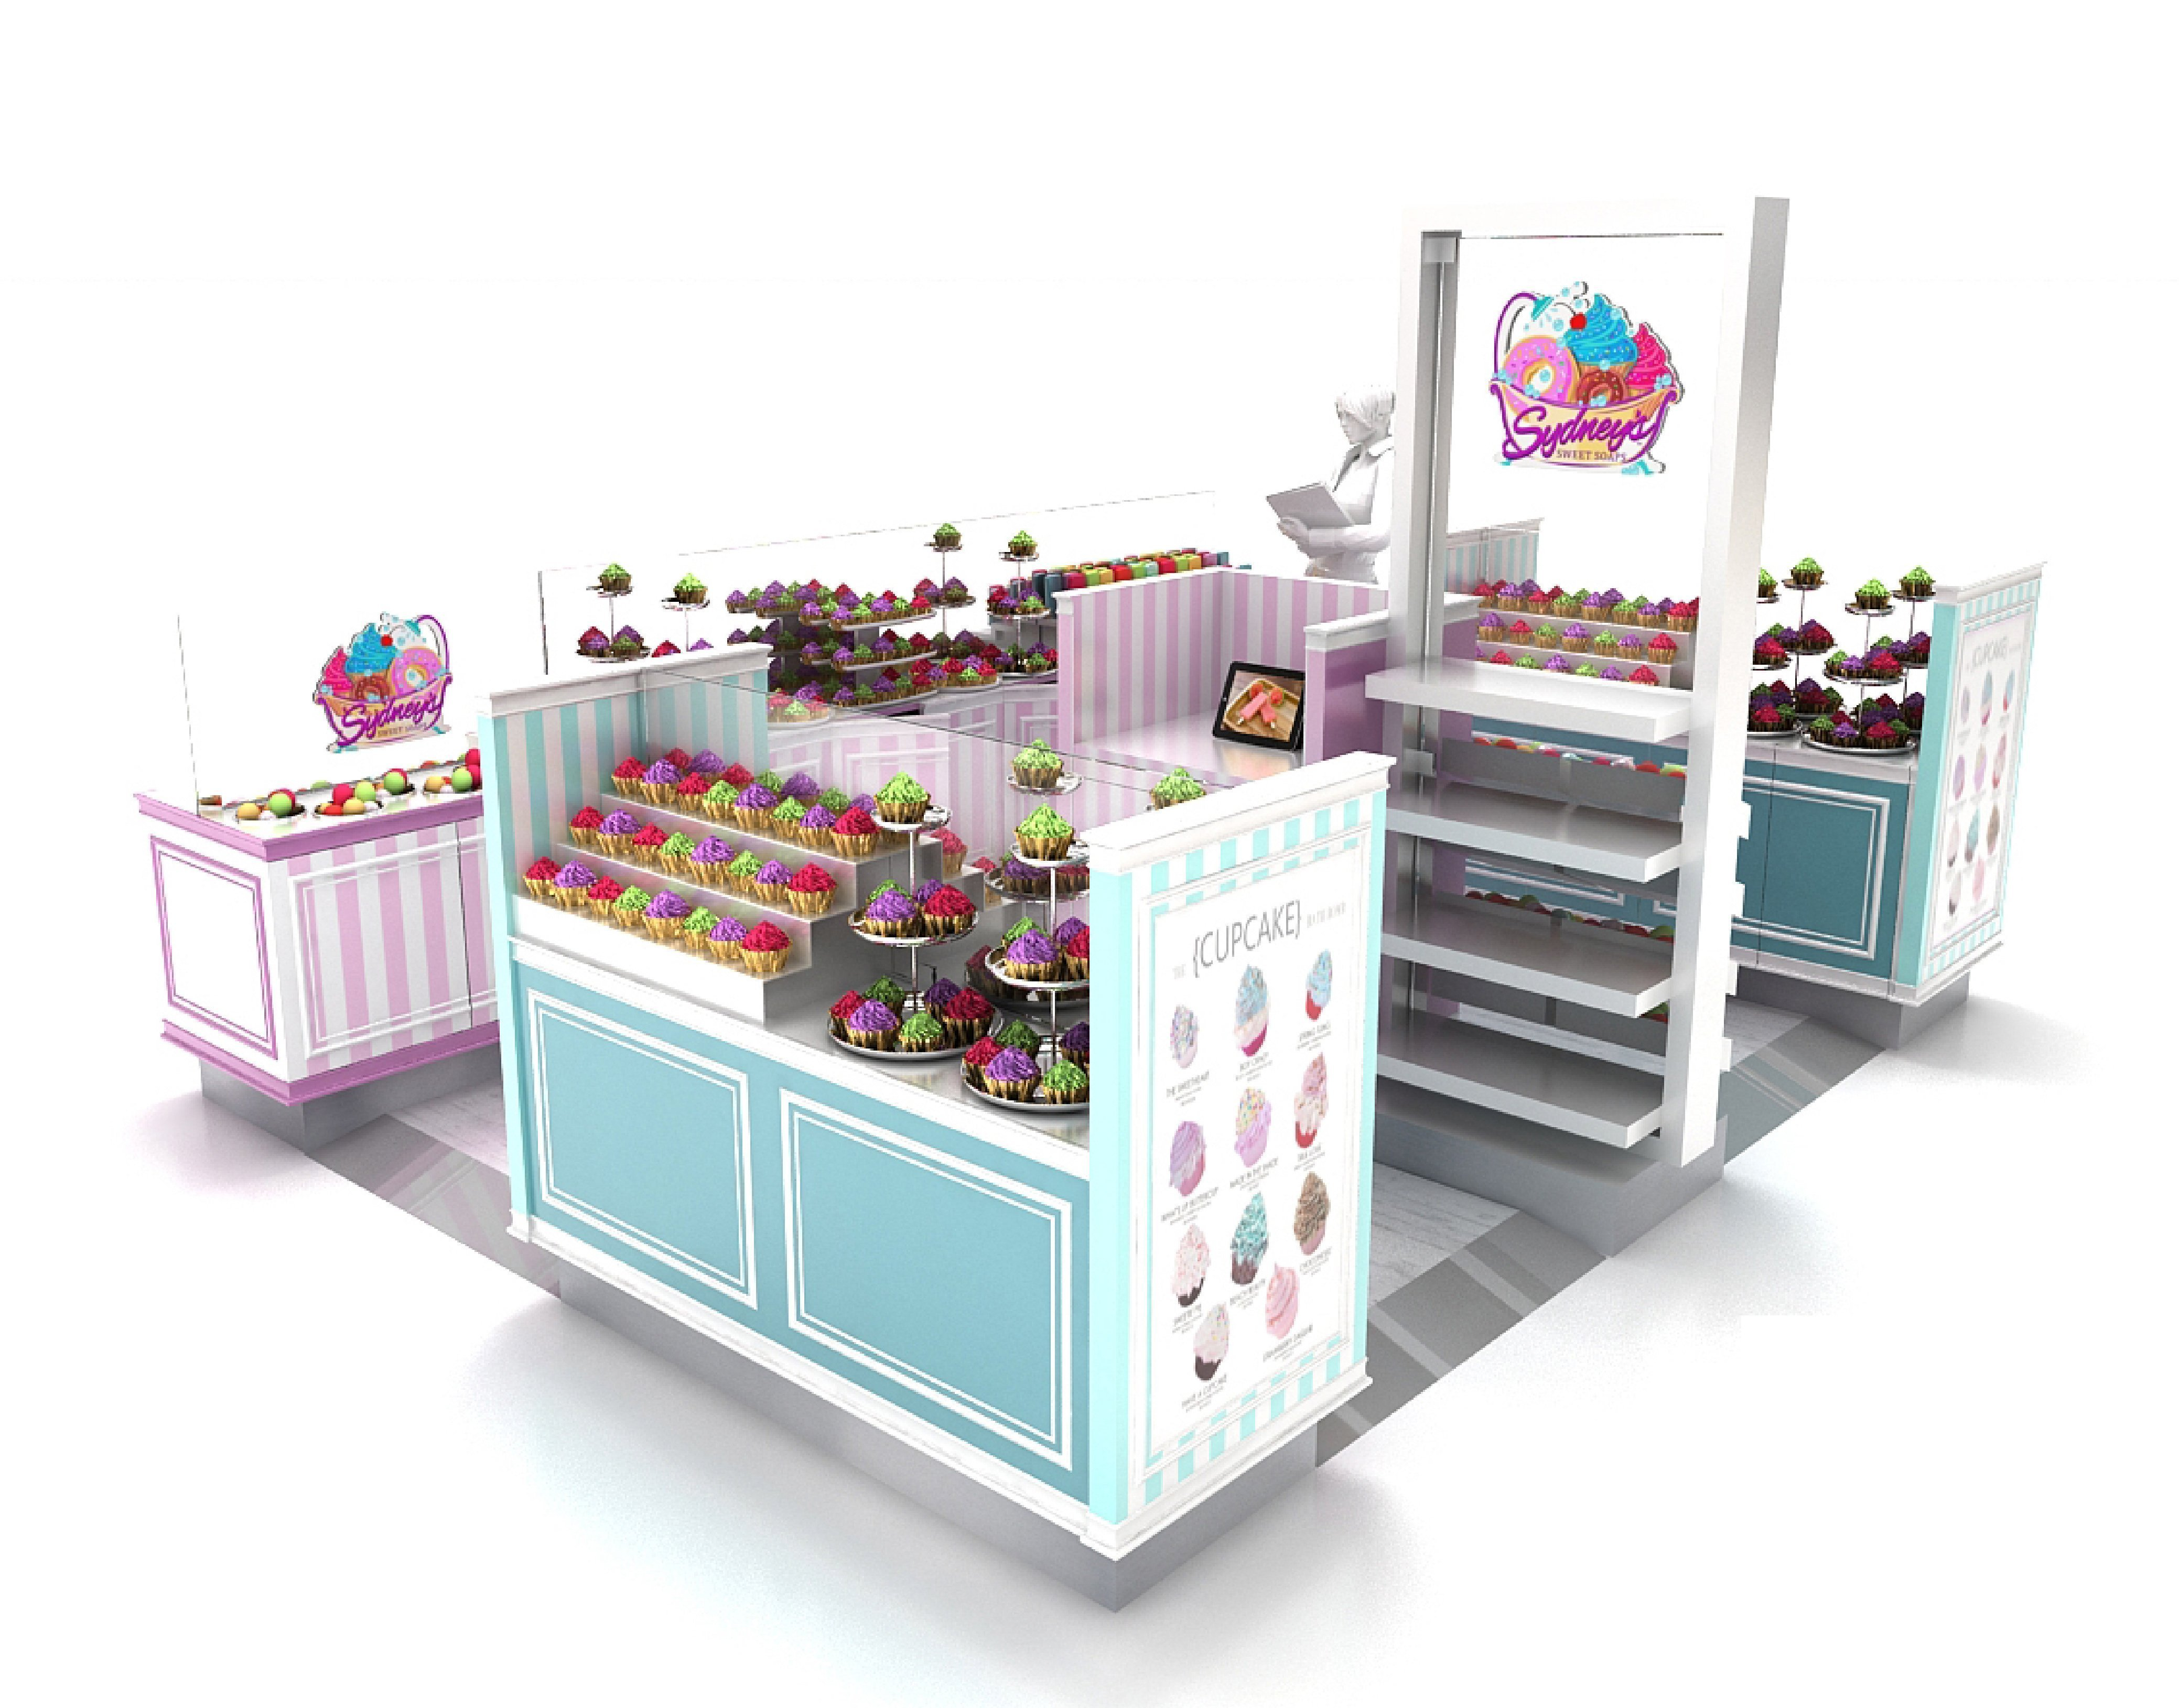 cupcake kiosk in mall